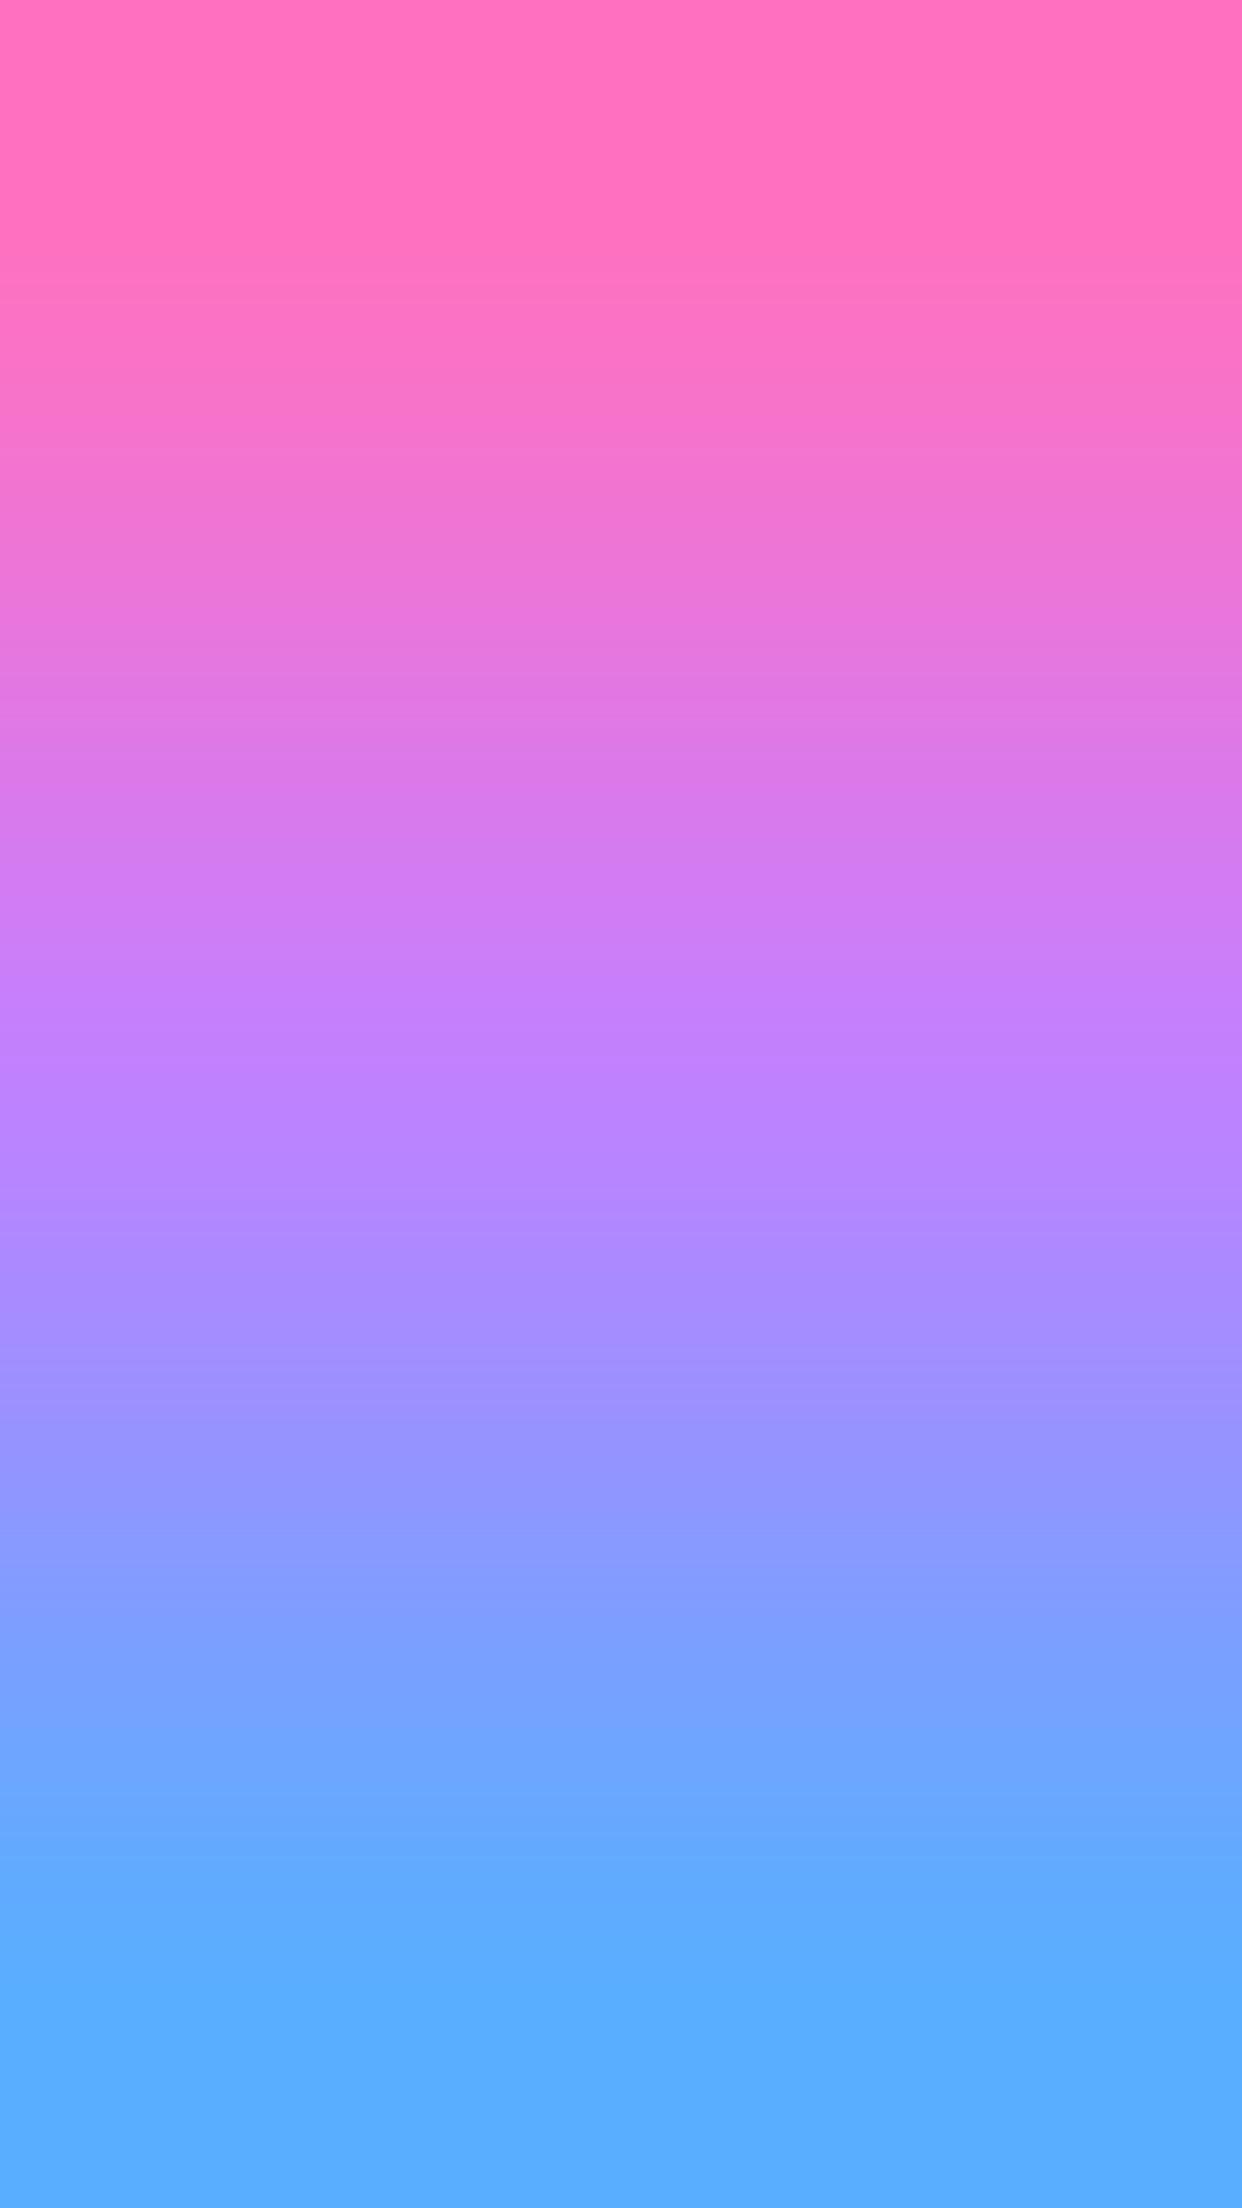 pink, purple, blue, violet, gradient, ombre, wallpaper, background,